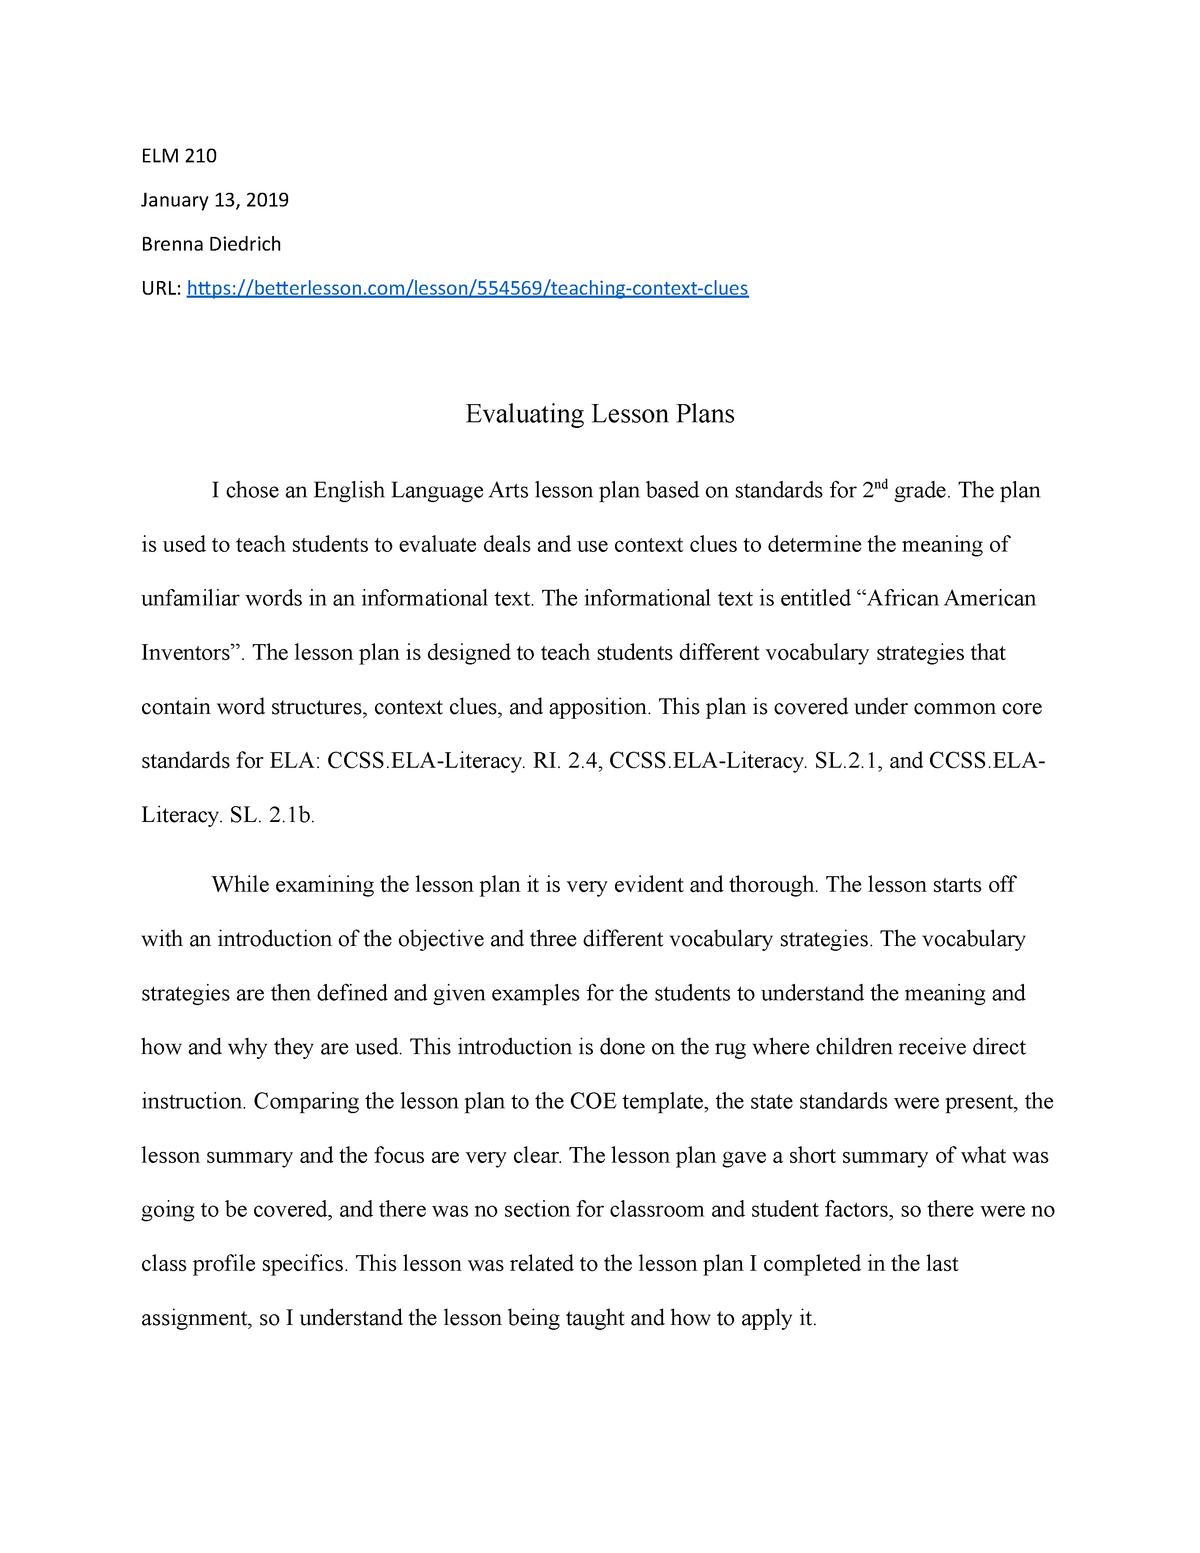 ELM 210 Evaluating lesson plans - ELM-210: Instructional Planning